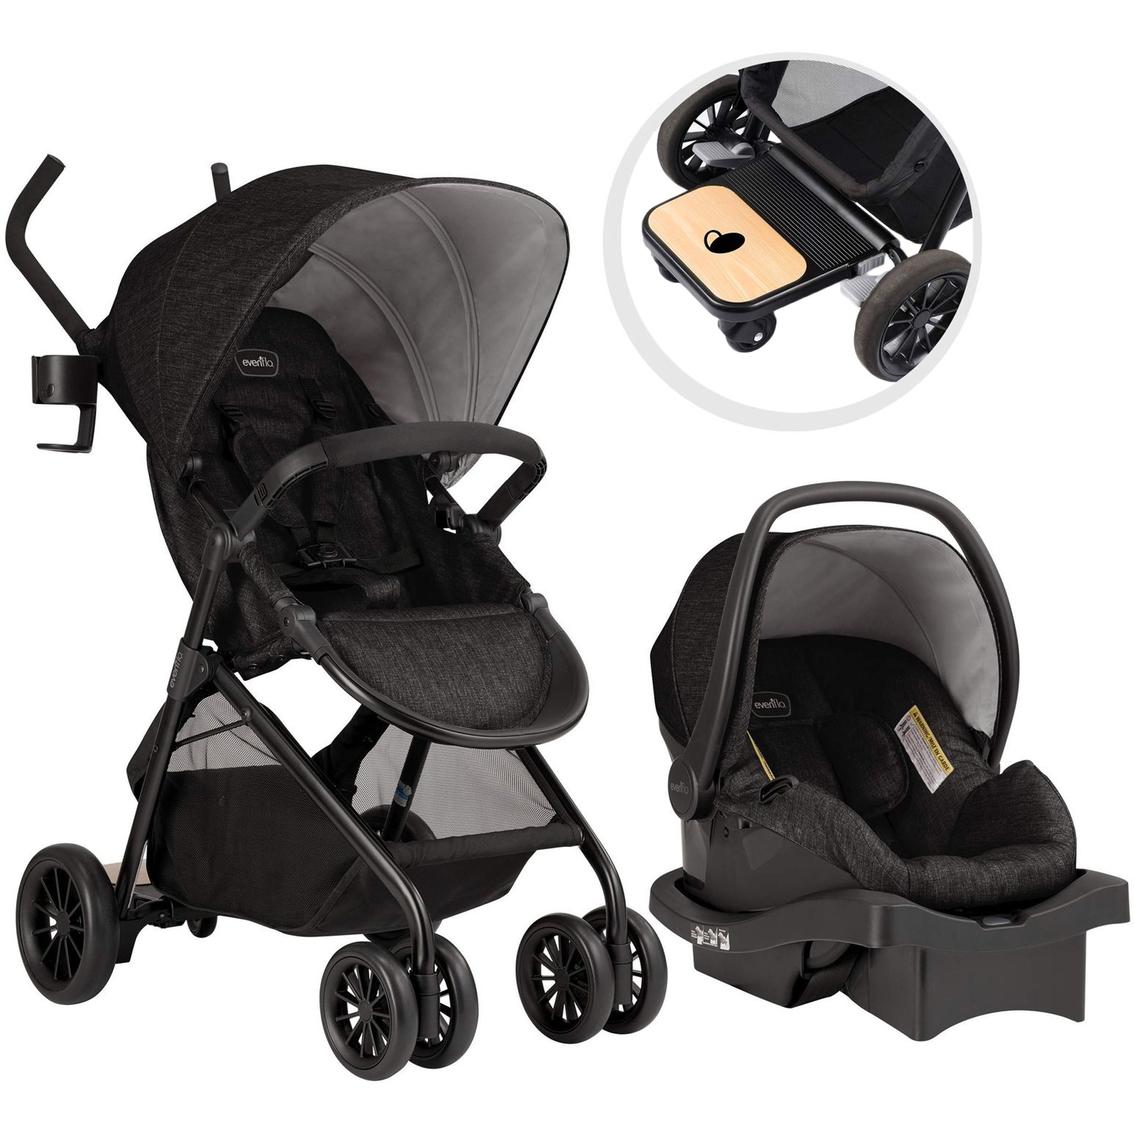 1bfc3e9b0fc0 Evenflo Sibby Travel System 2.0   Travel Systems   Baby & Toys ...